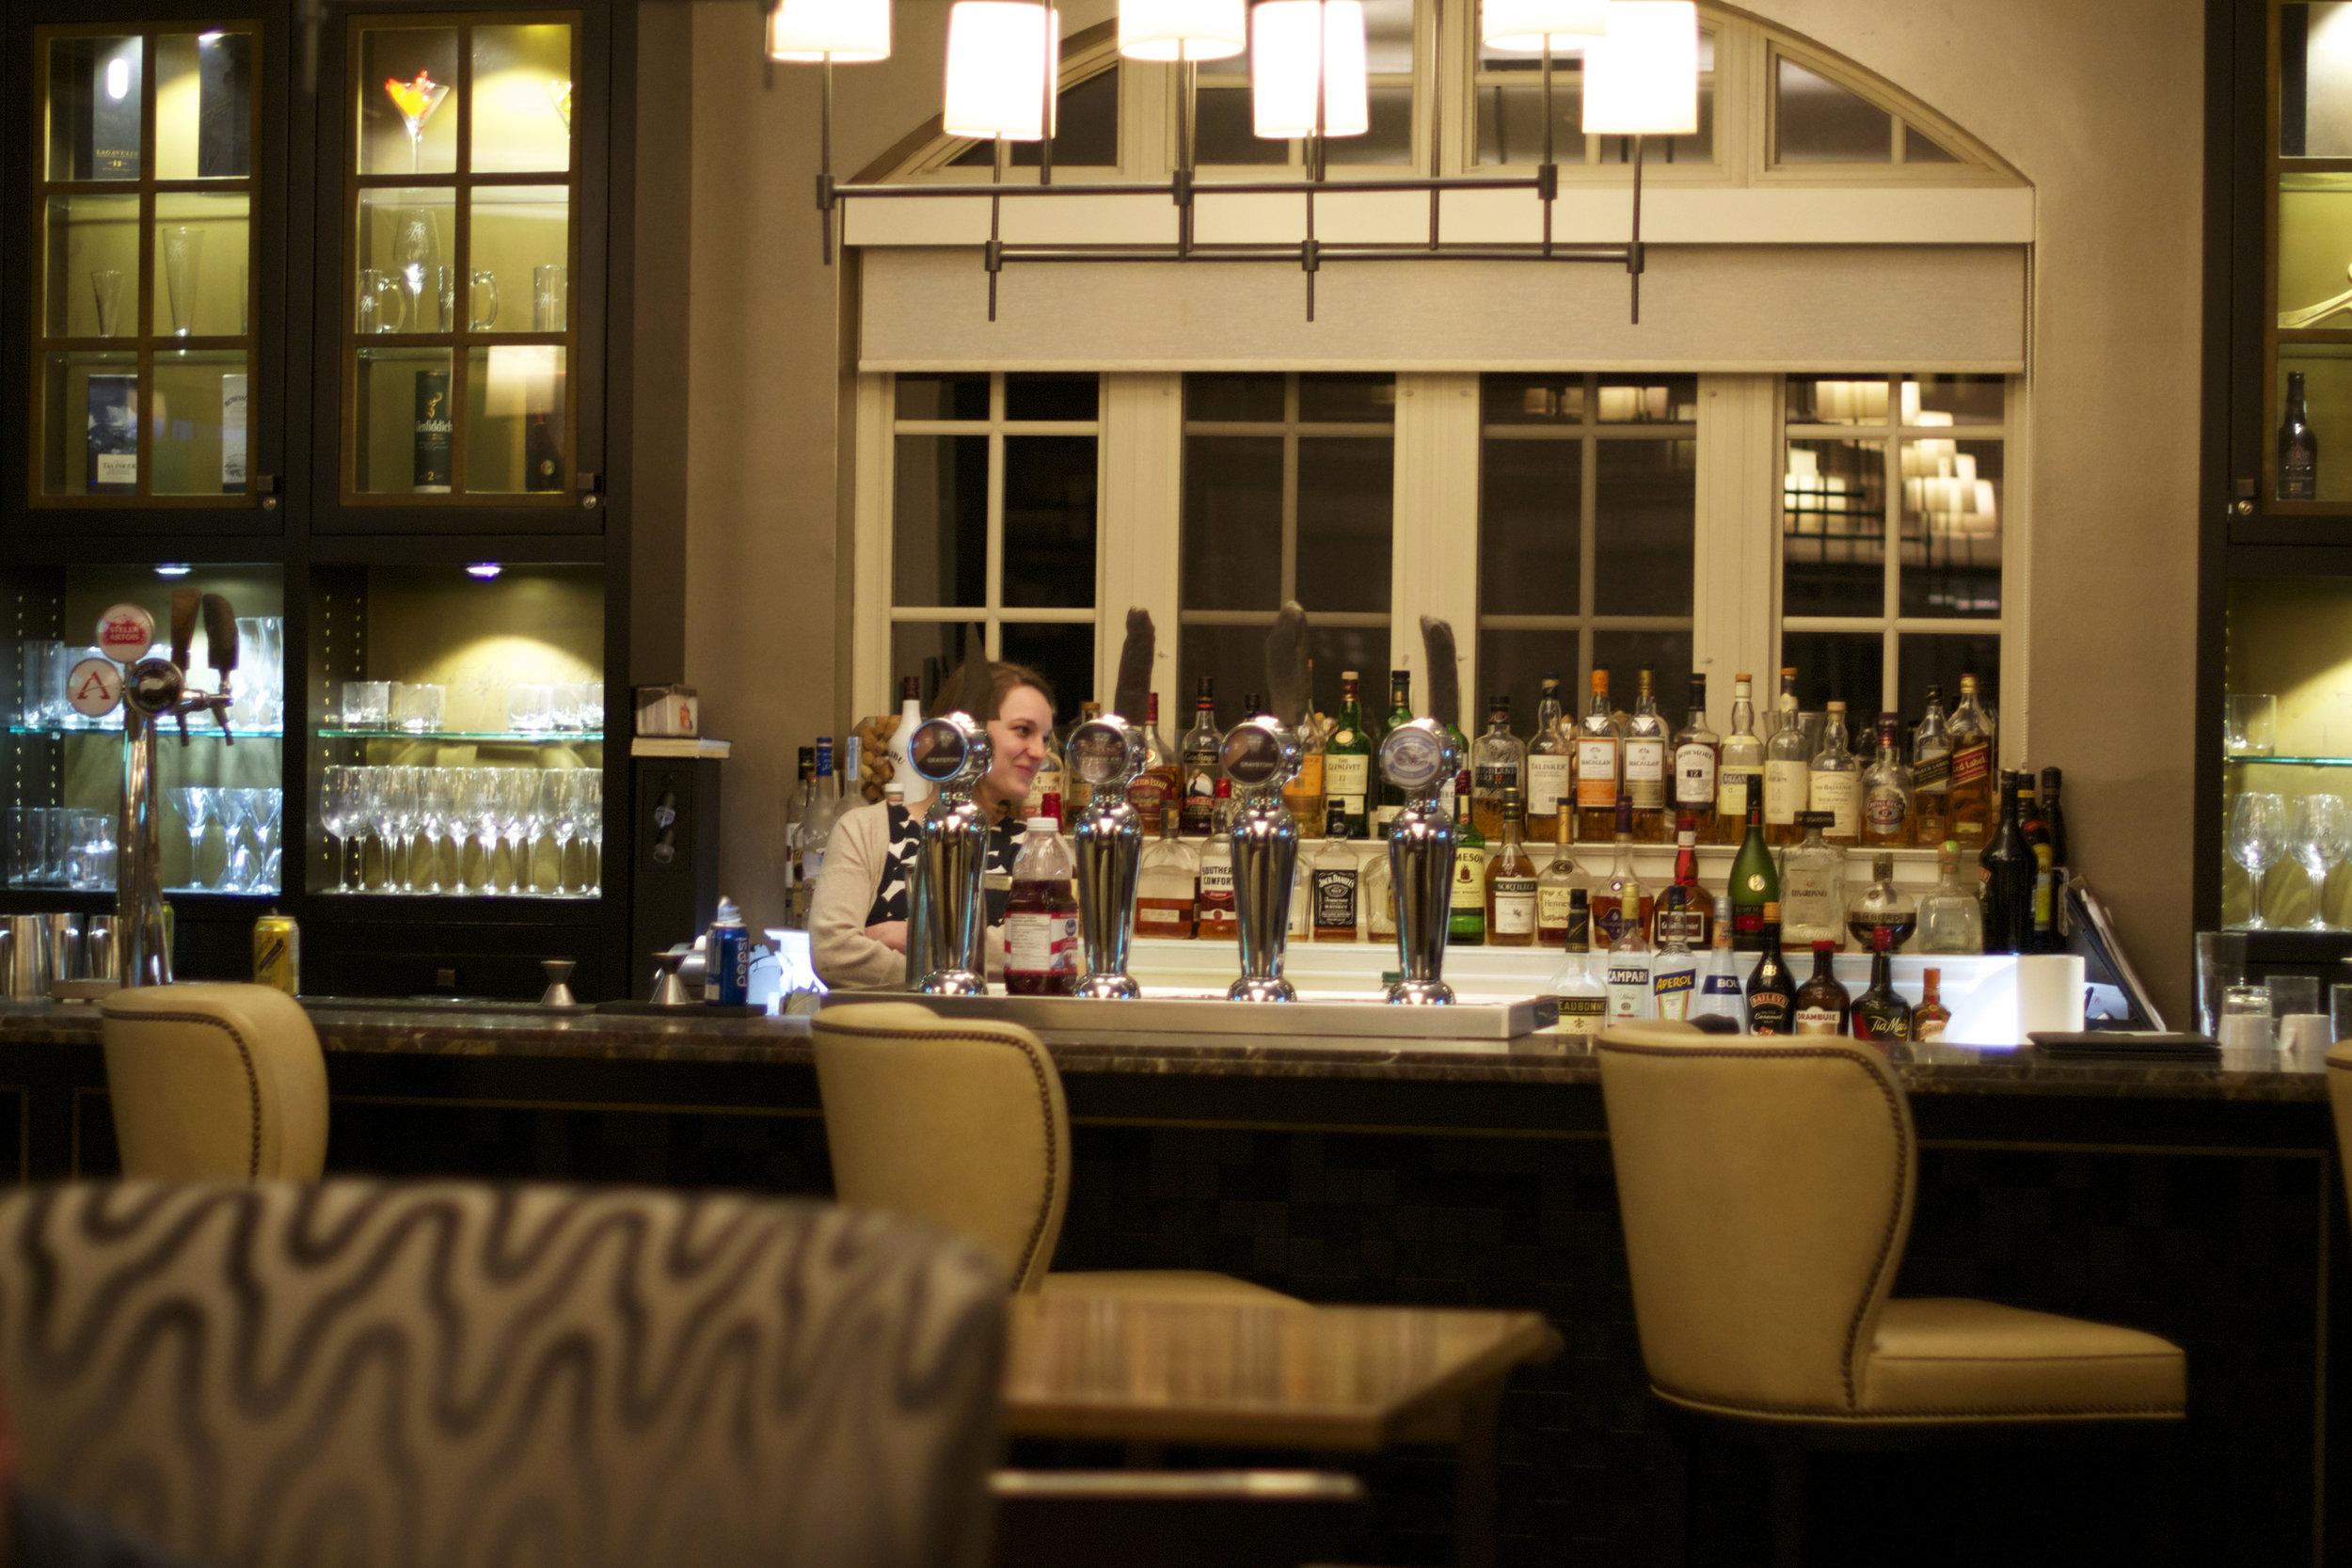 hotel-bar1.jpg